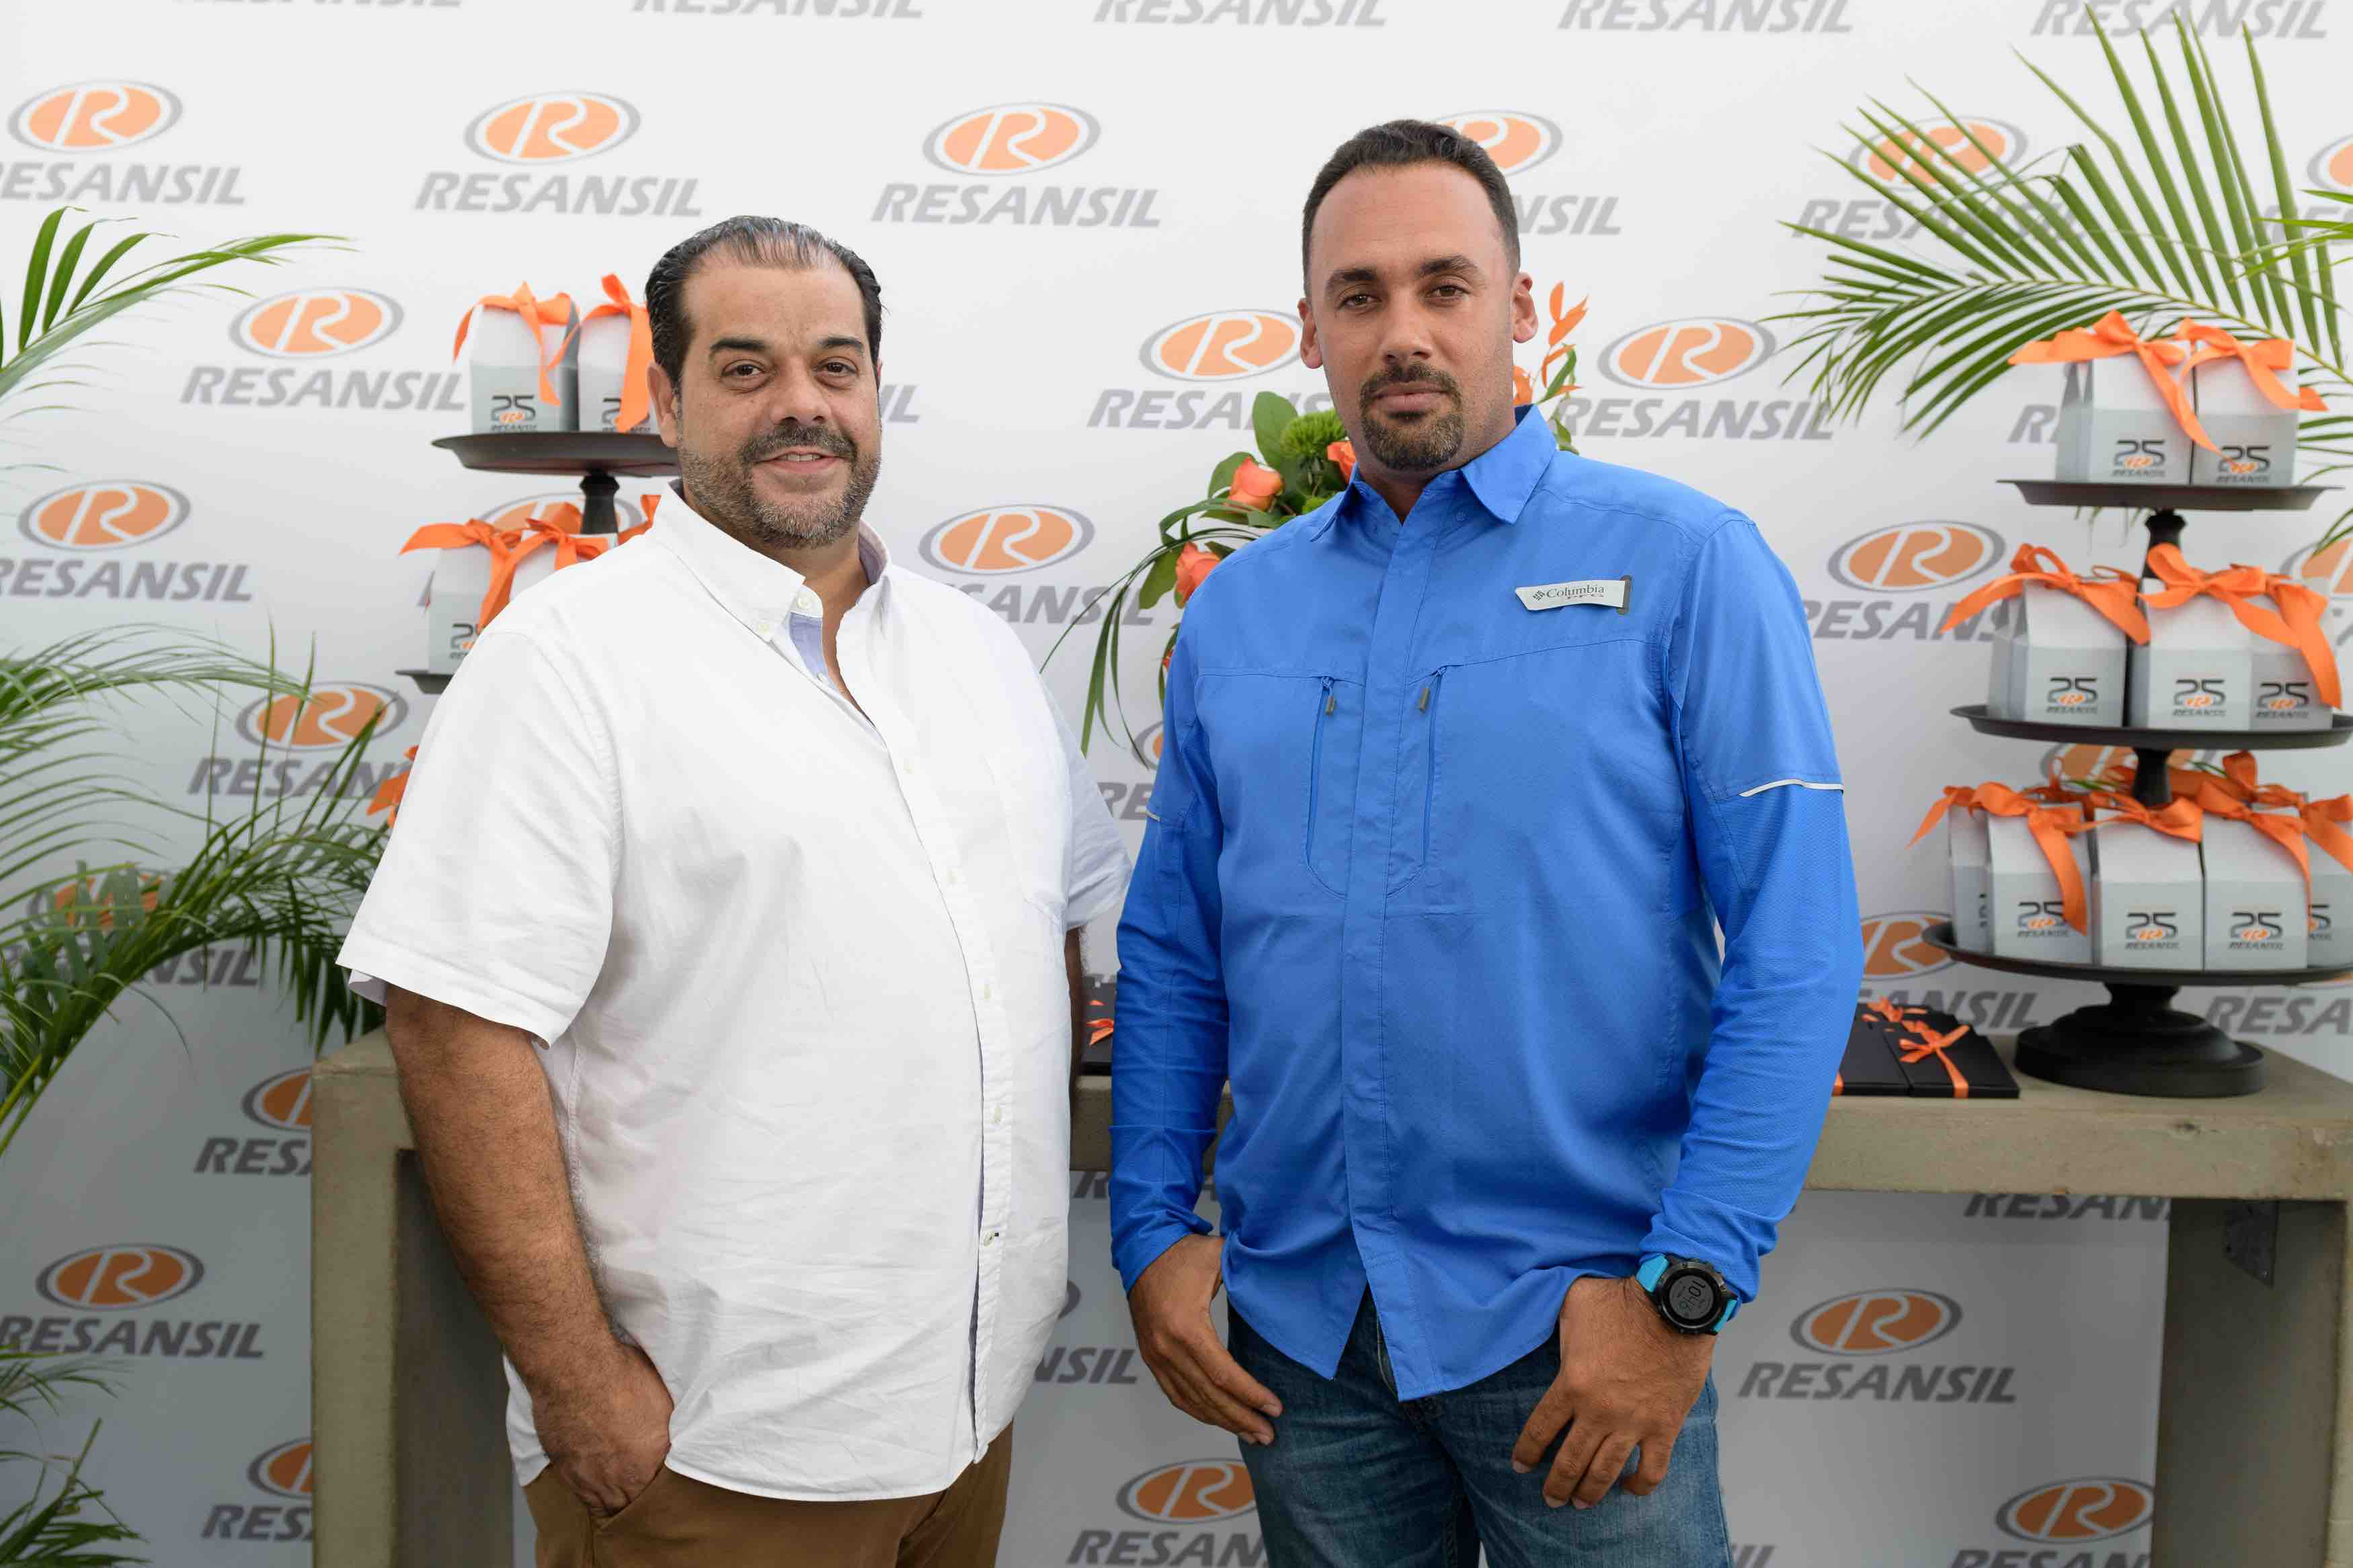 15. Carlos Termini & Moises Nolasco